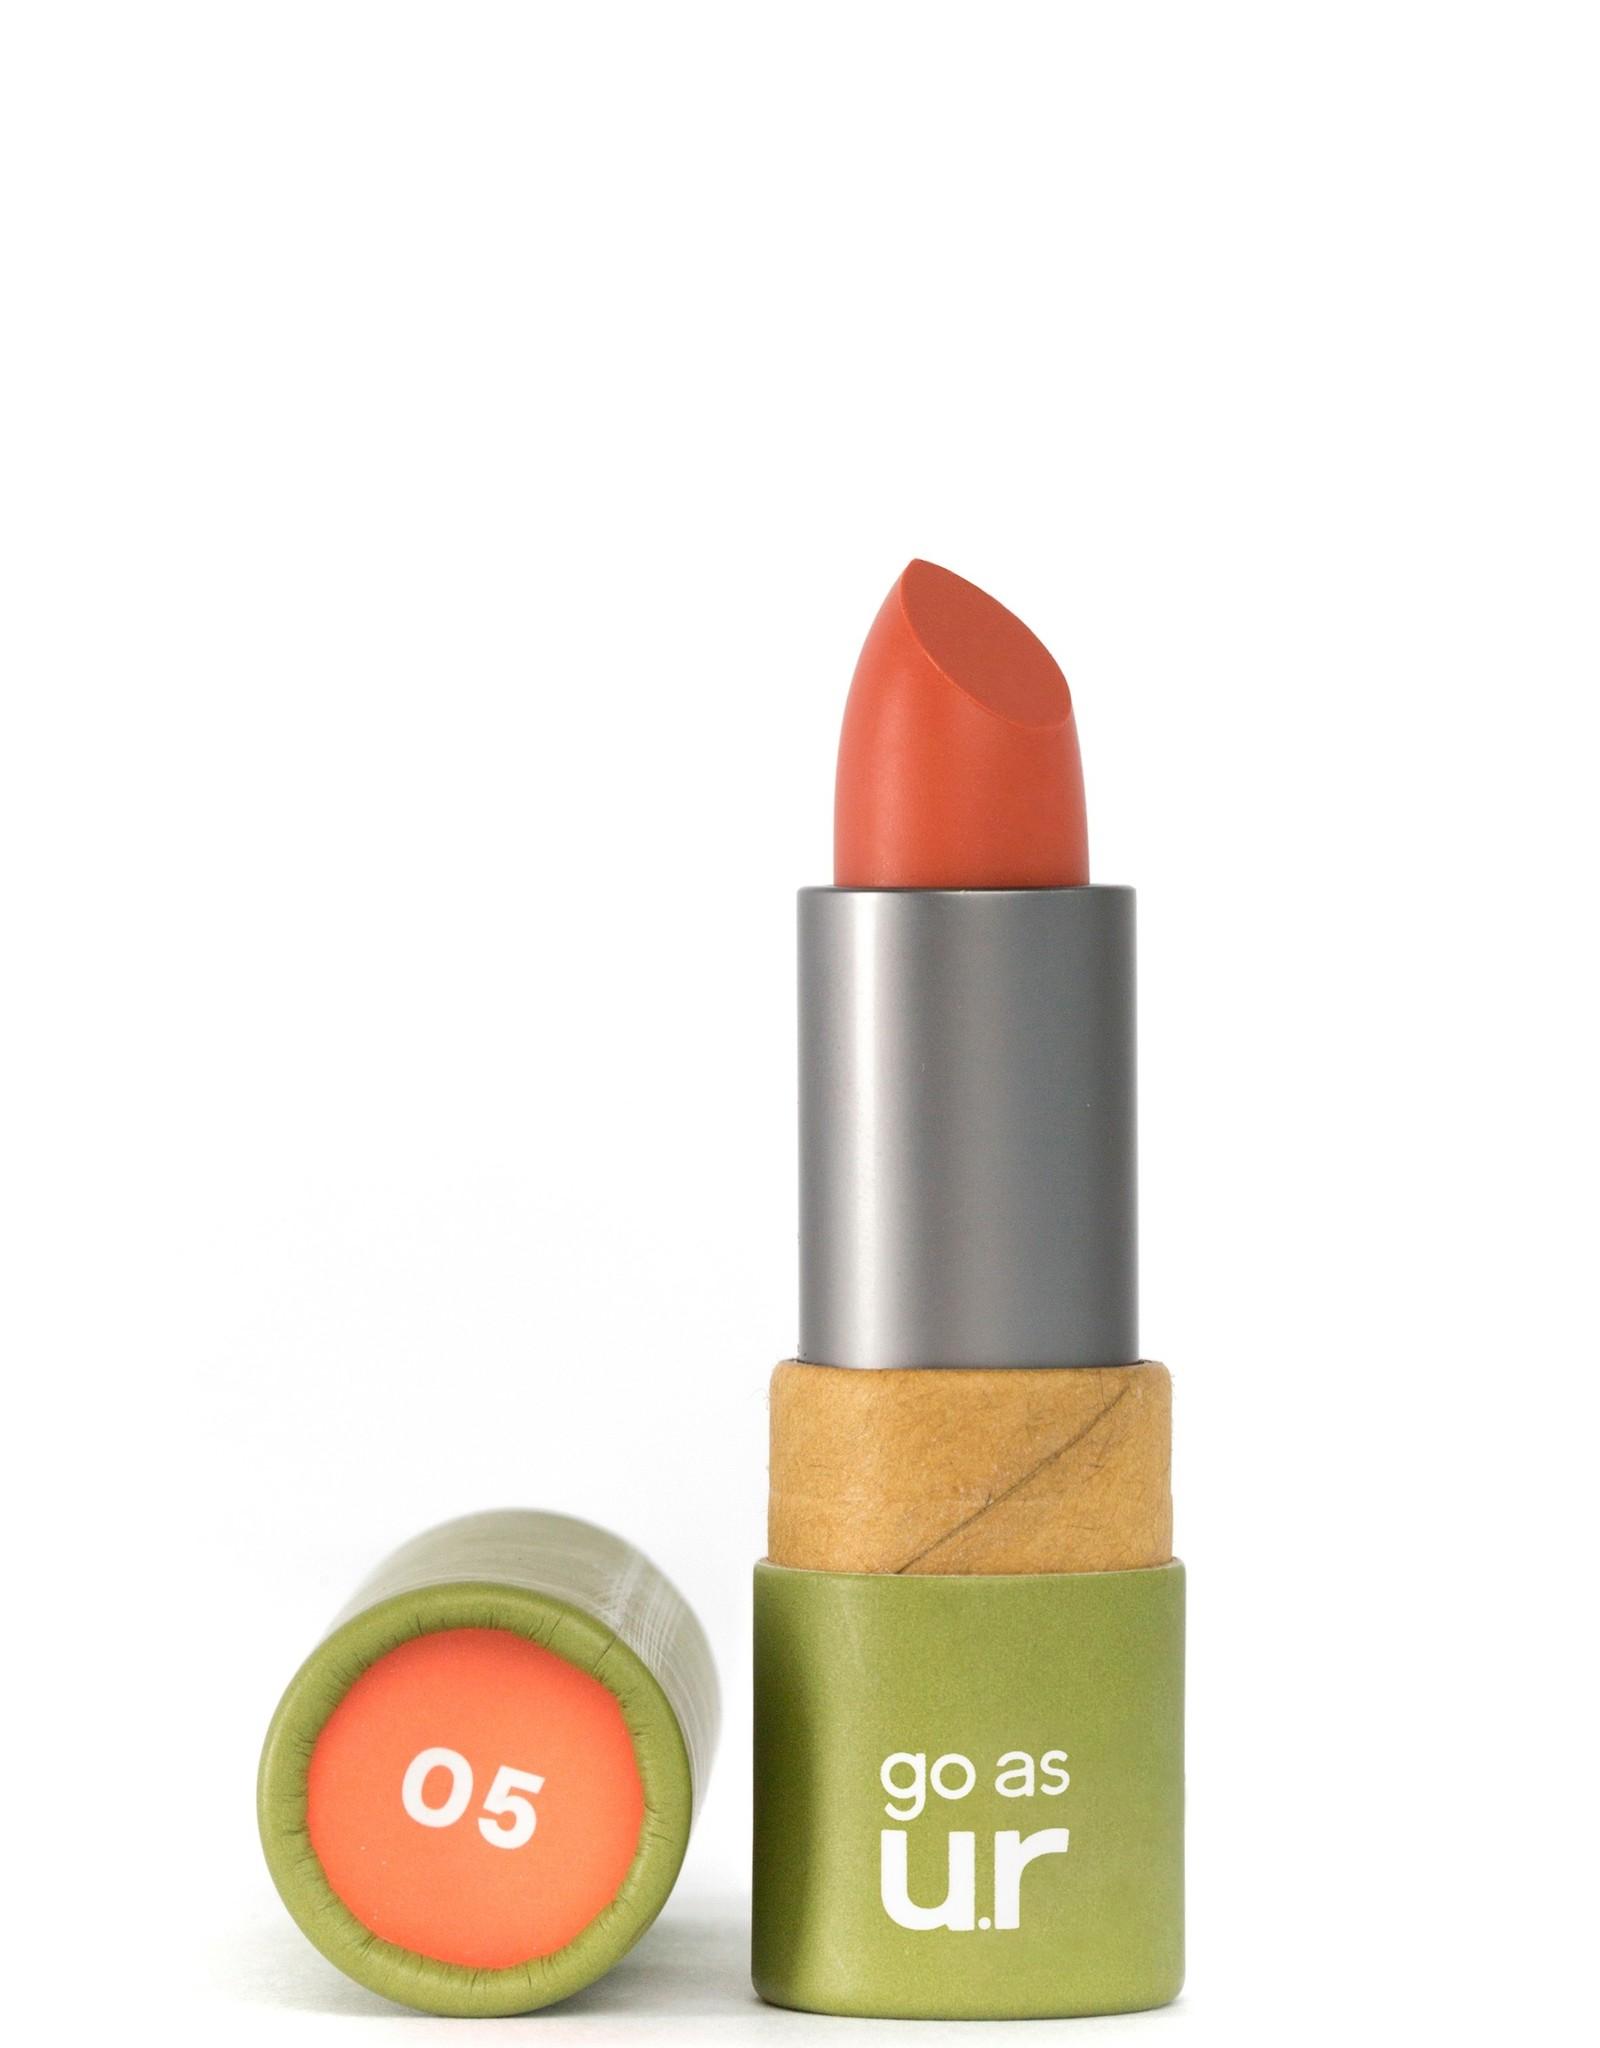 Go as ur Vegan Lipstick Poppy pink